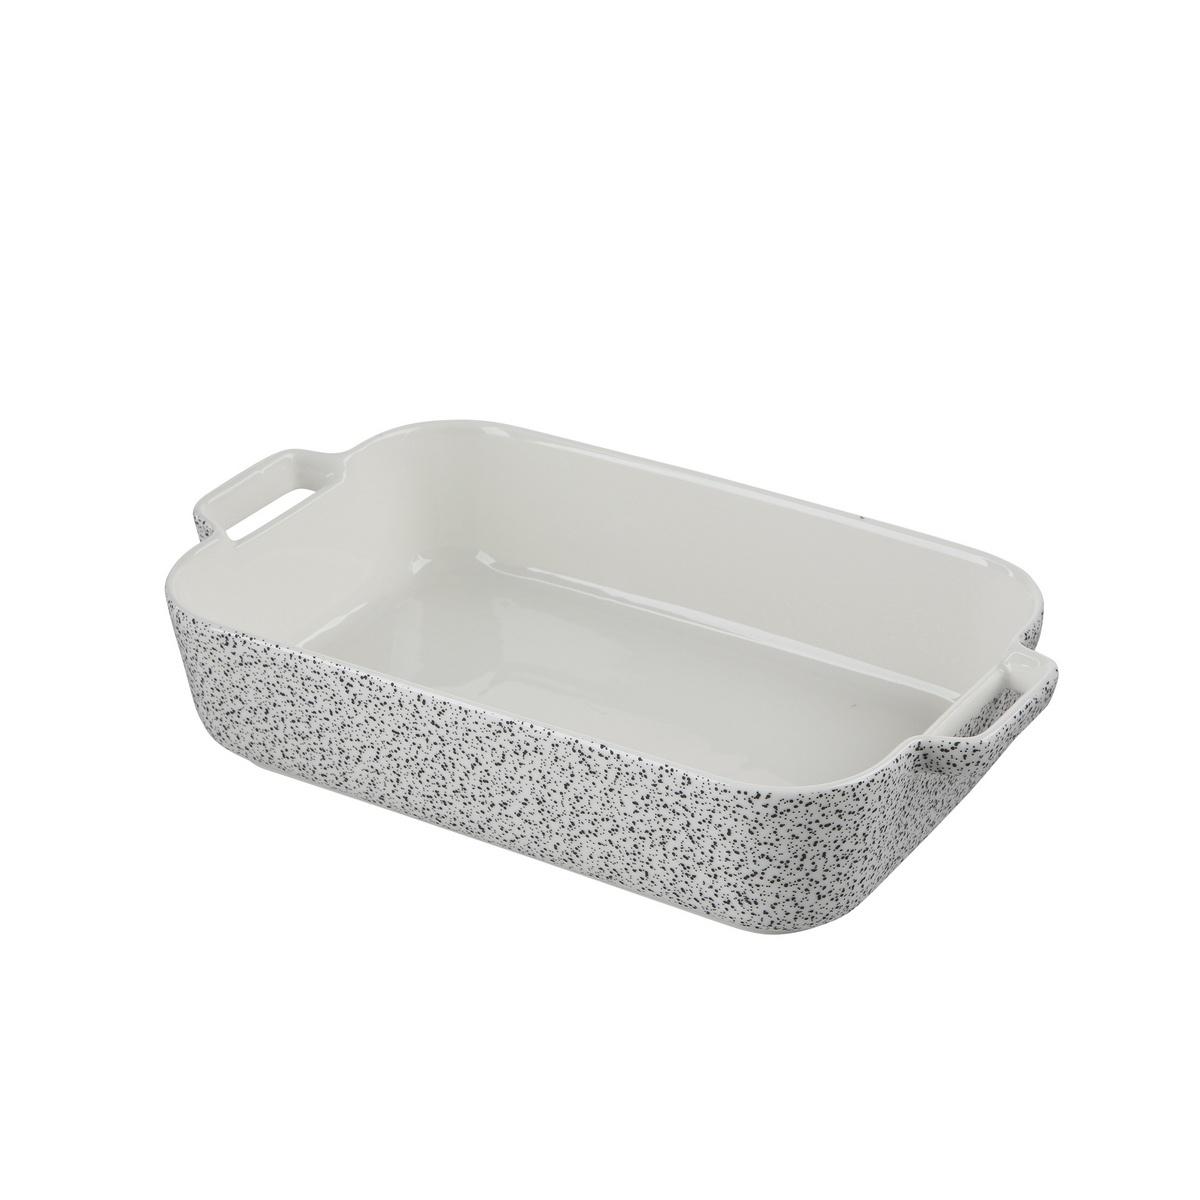 Altom Zapékací mísa Granit 24 x 14 x 6 cm, bílá , 24 x 14 x 6 cm